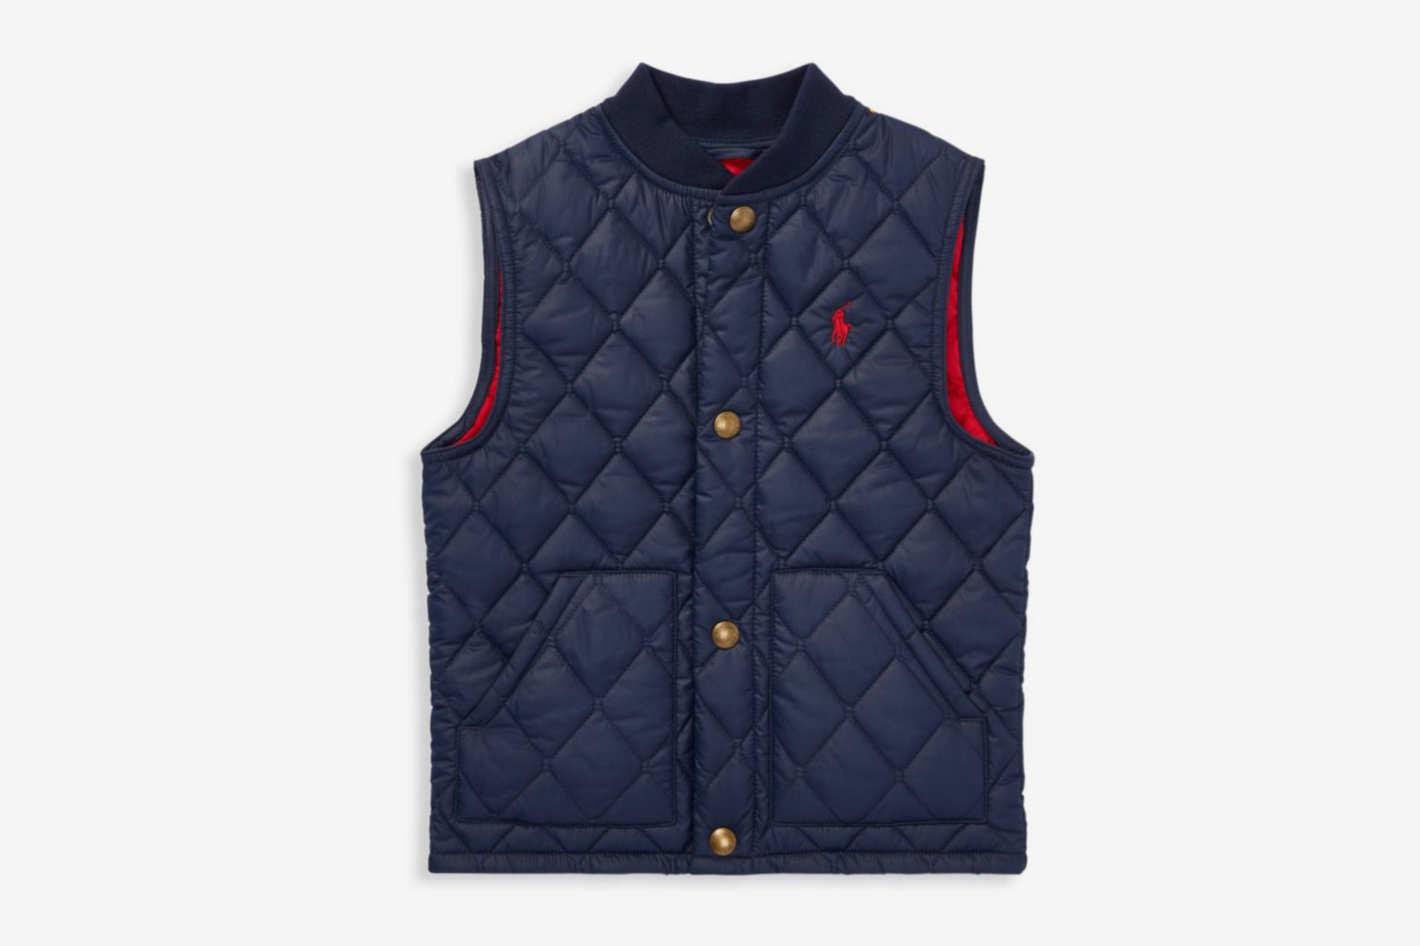 Ralph Lauren Little Boy's & Boy's Quilted Vest